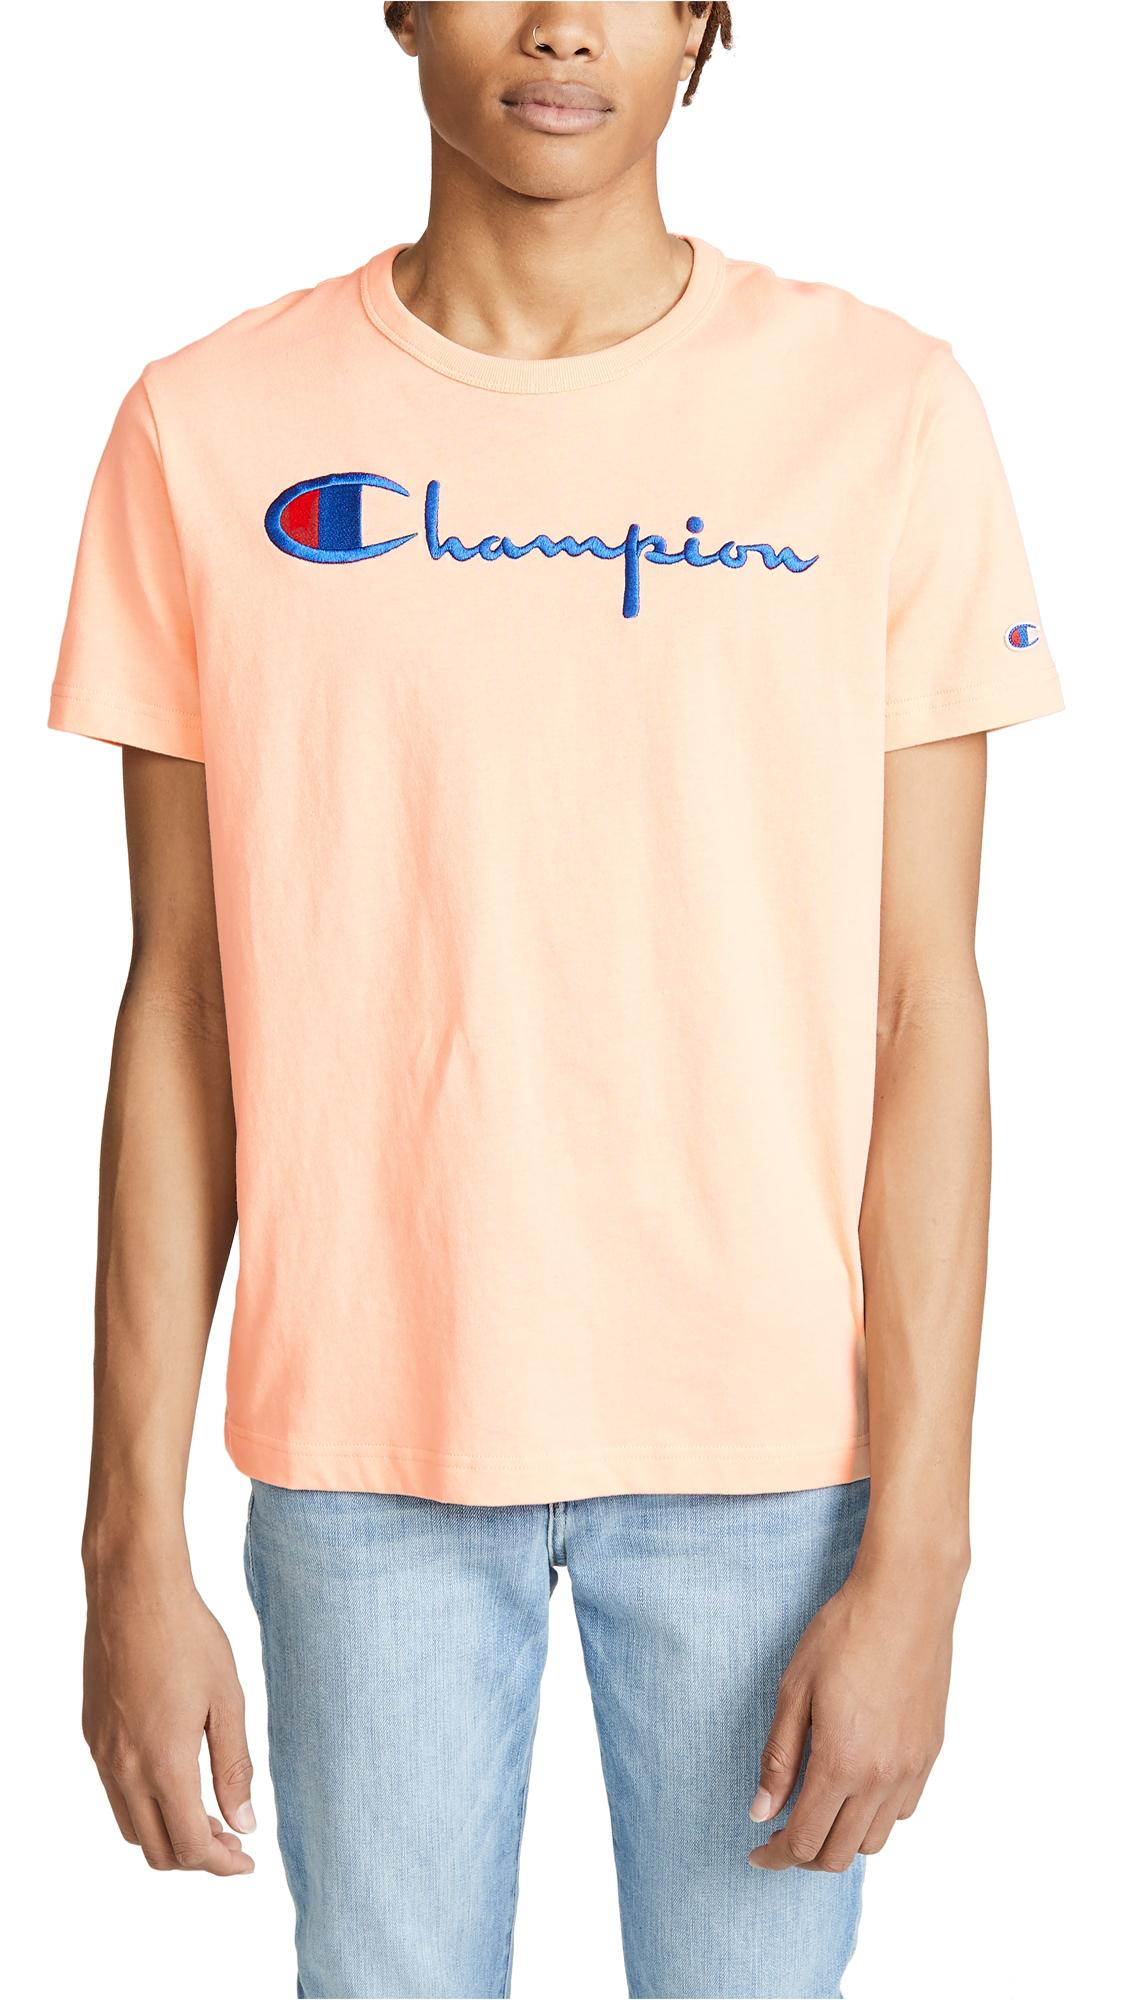 cc1e8e72 CHAMPION Men's Short Sleeve Crew Tee in Pink. Champion Men